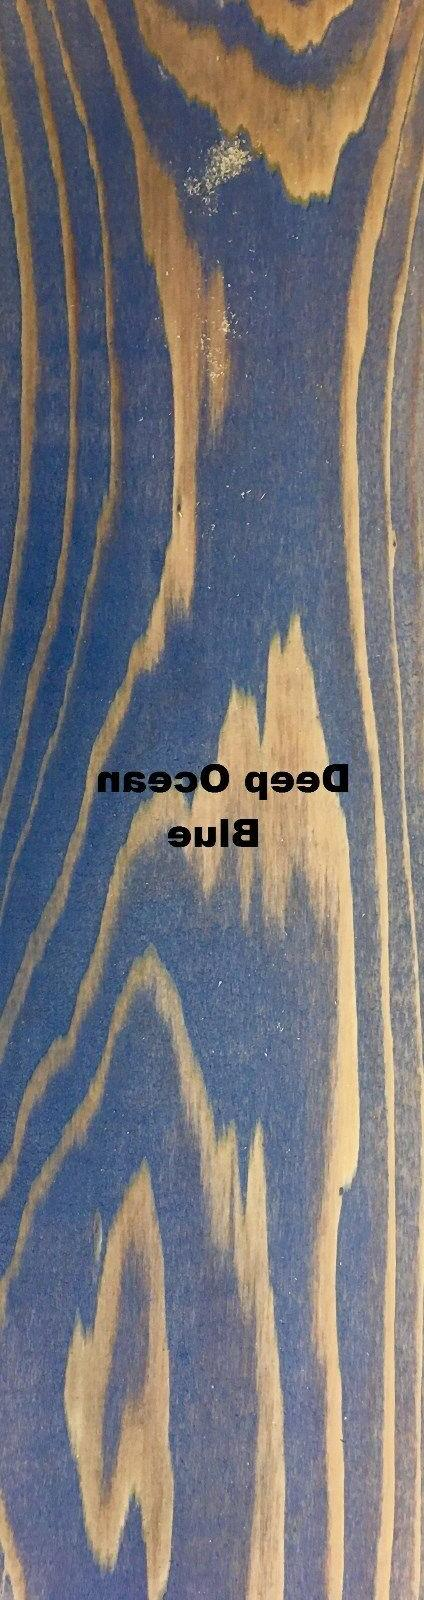 5ft Cypress Wood Diamond Porch Bench Swing USA